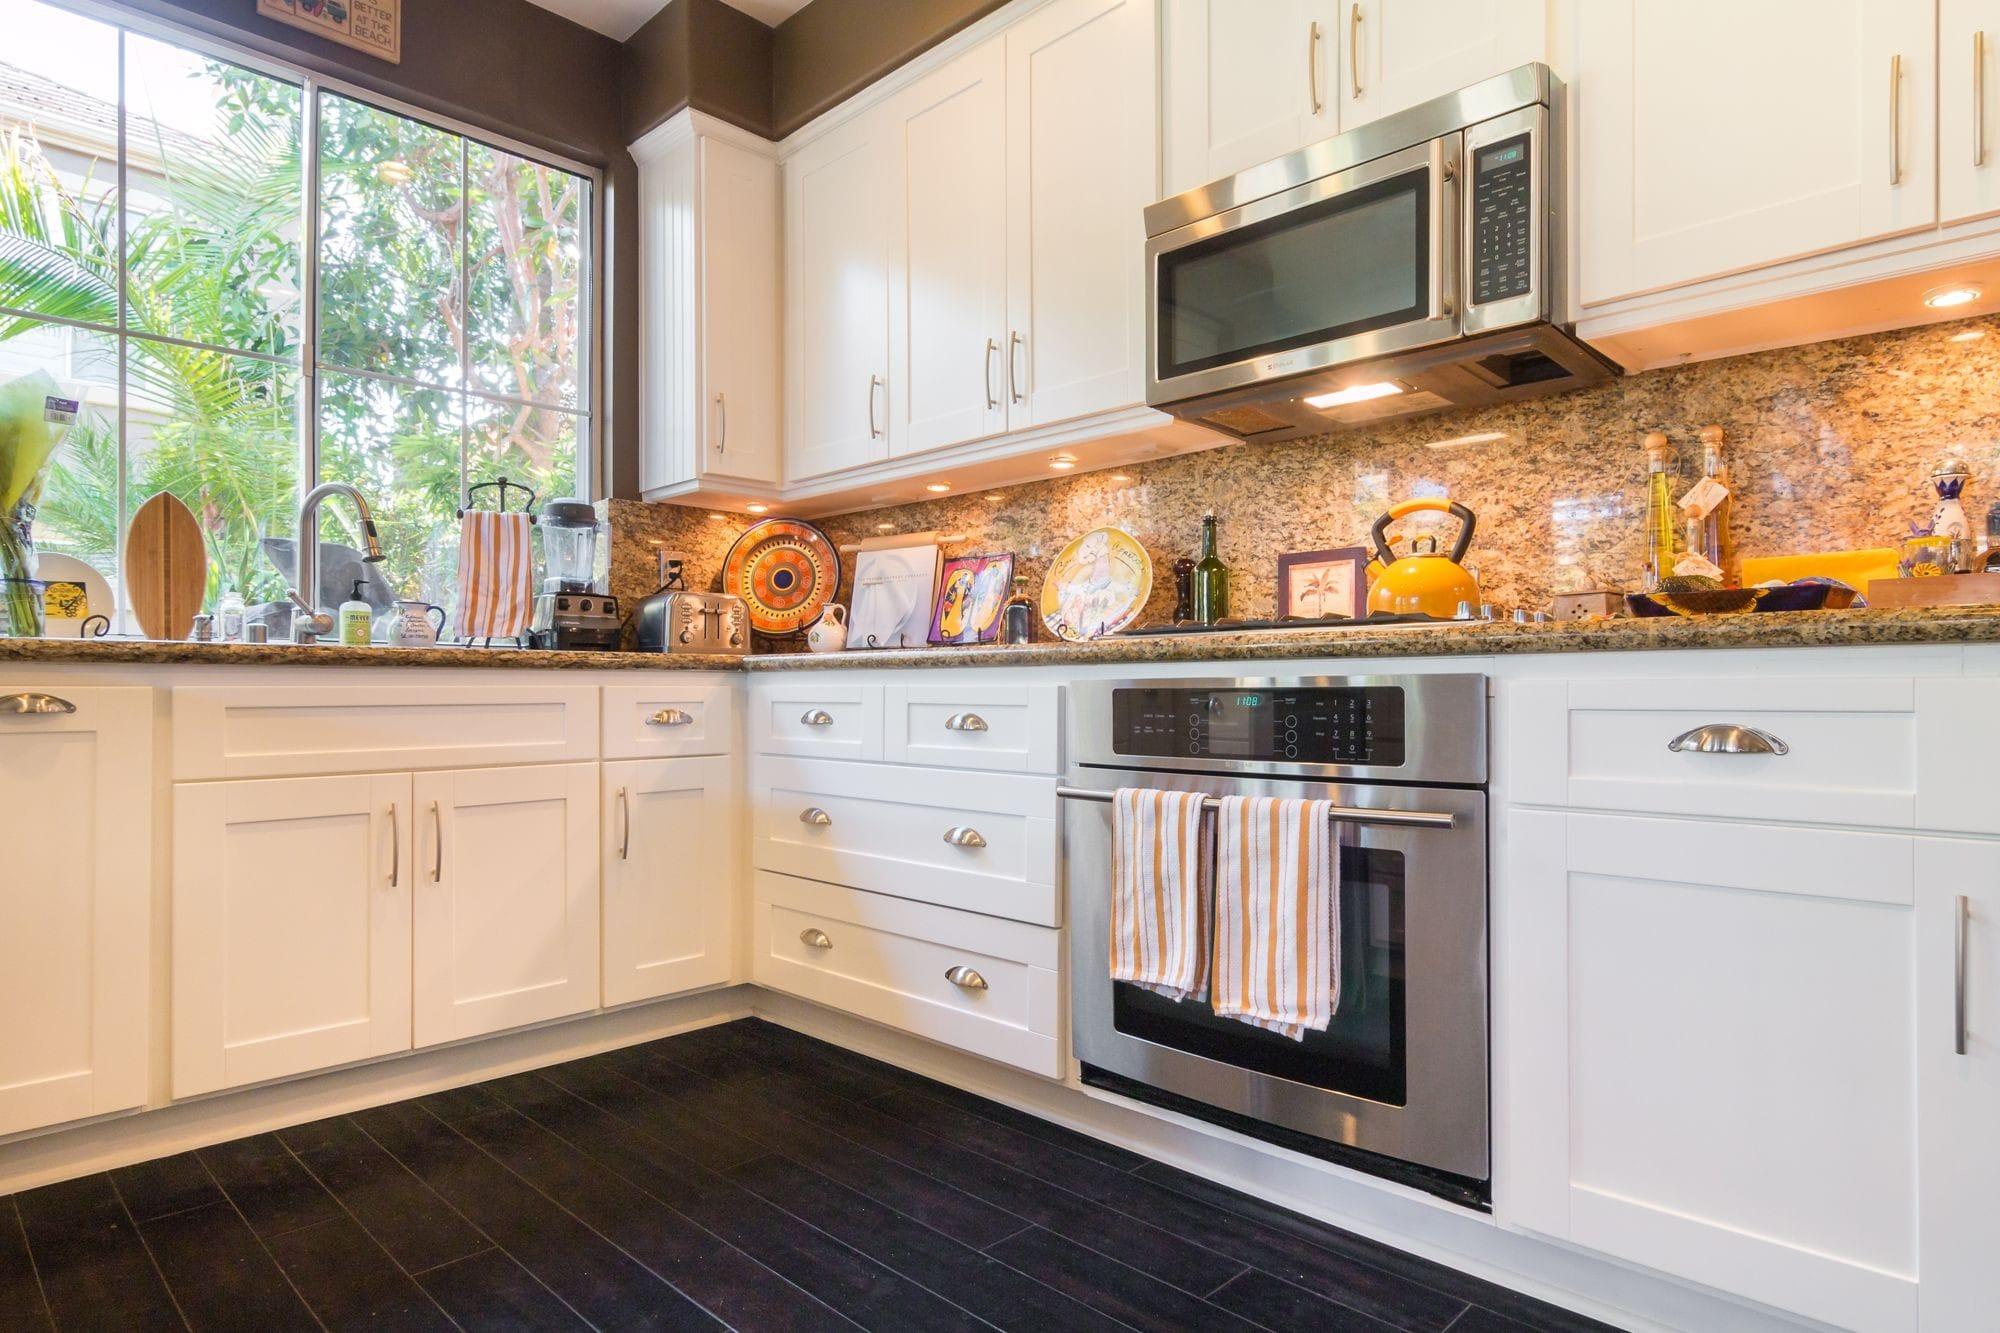 Kitchen Cabinet Refacing in Sun City, Arizona 85373